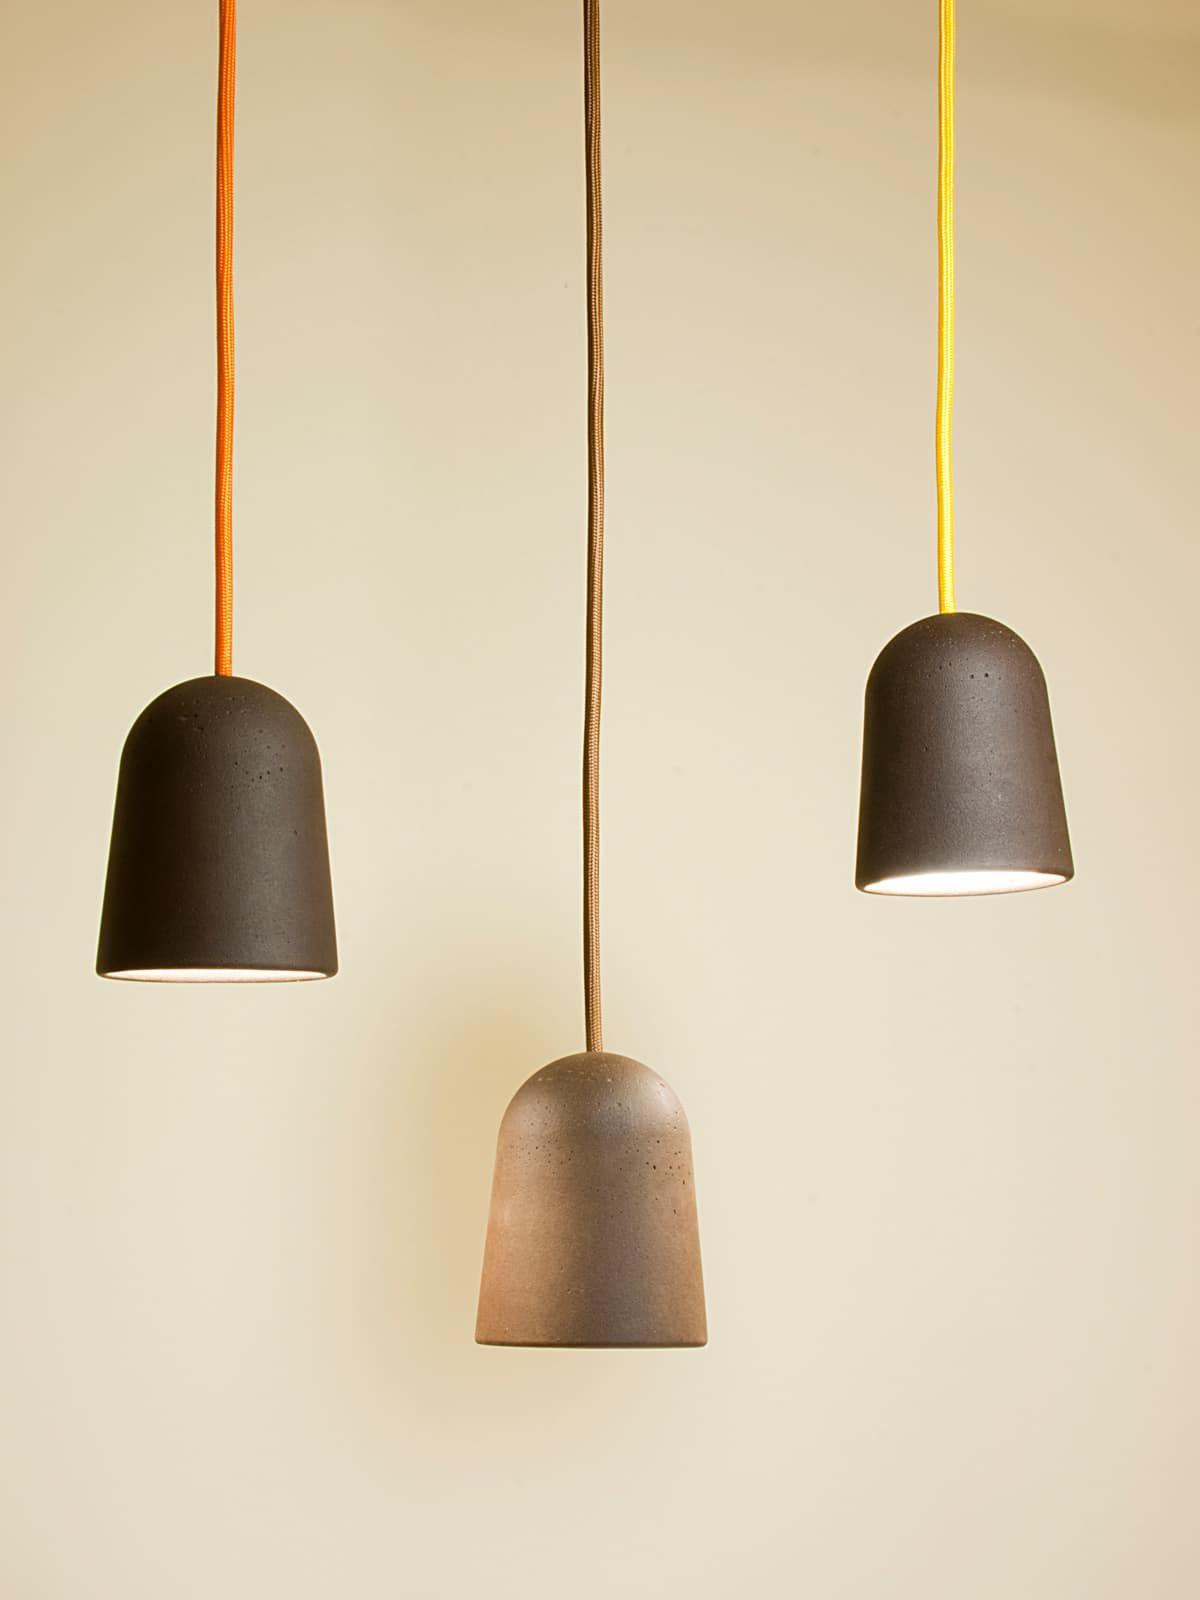 Koji S6 Lampen Aus Naturmaterialien Natural Materials Lampen